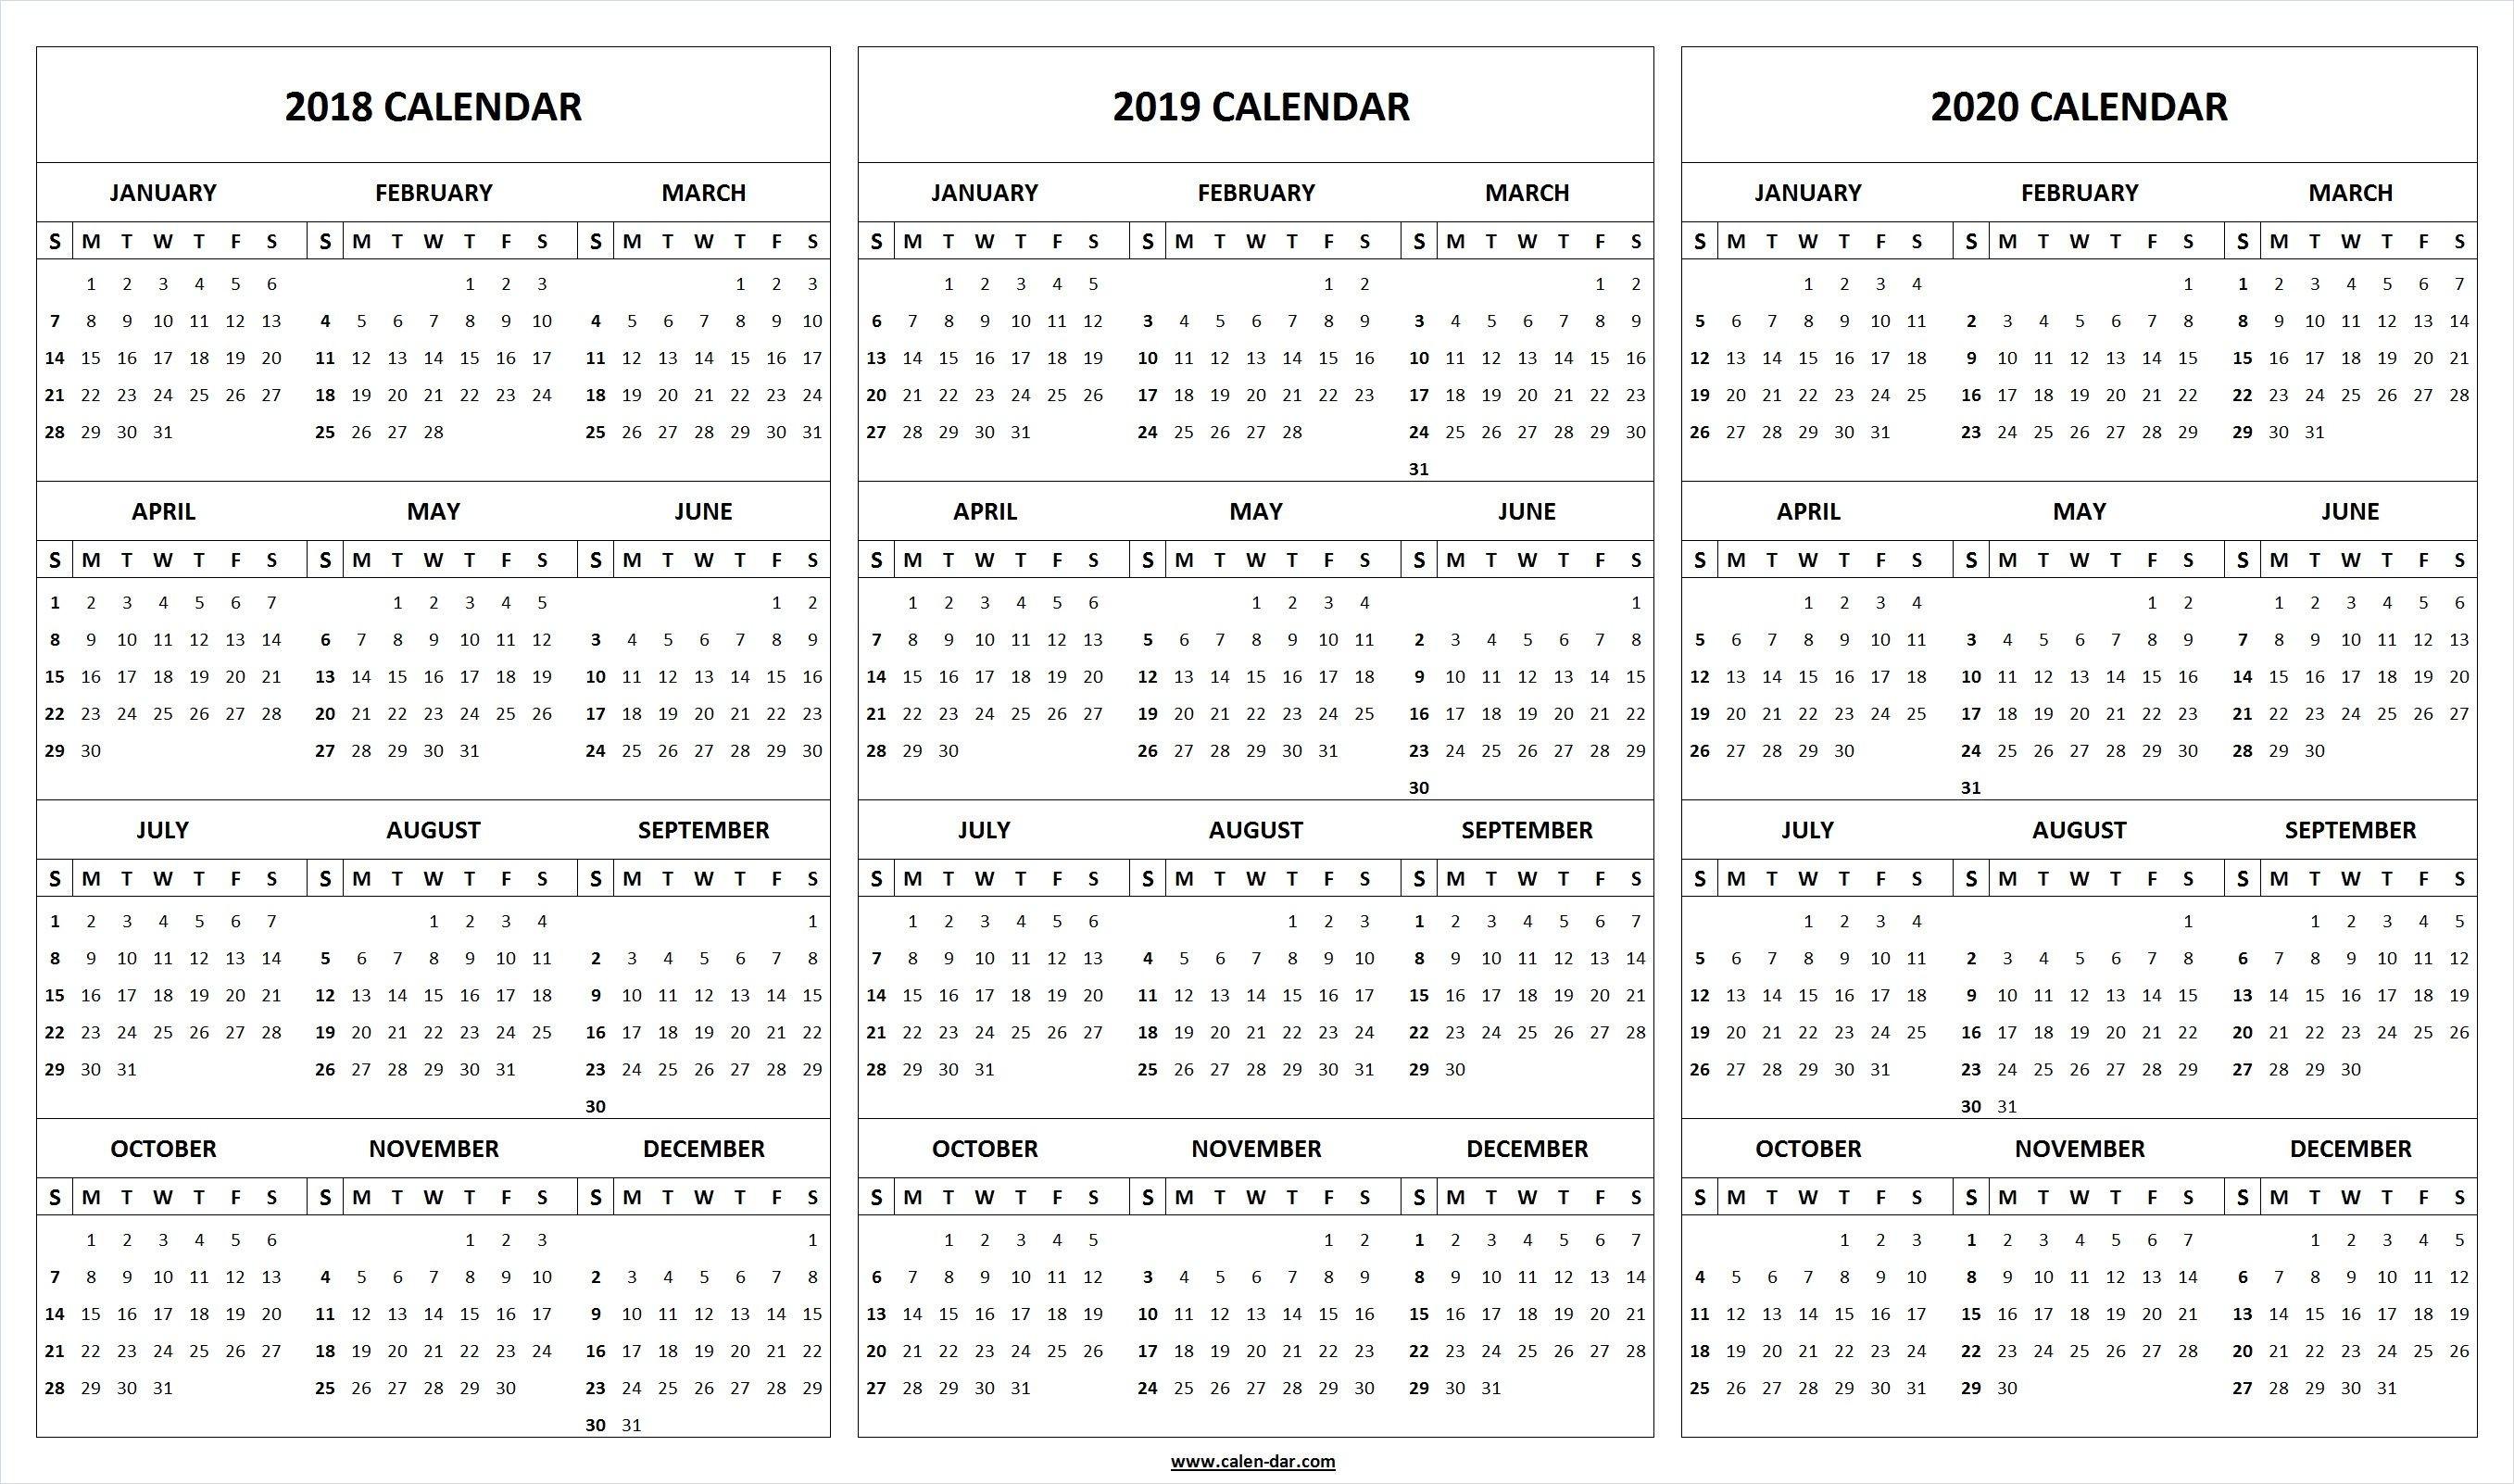 Print Blank 2018 2019 2020 Calendar Template | Organize-Blank 2 Pages Calendar 2020